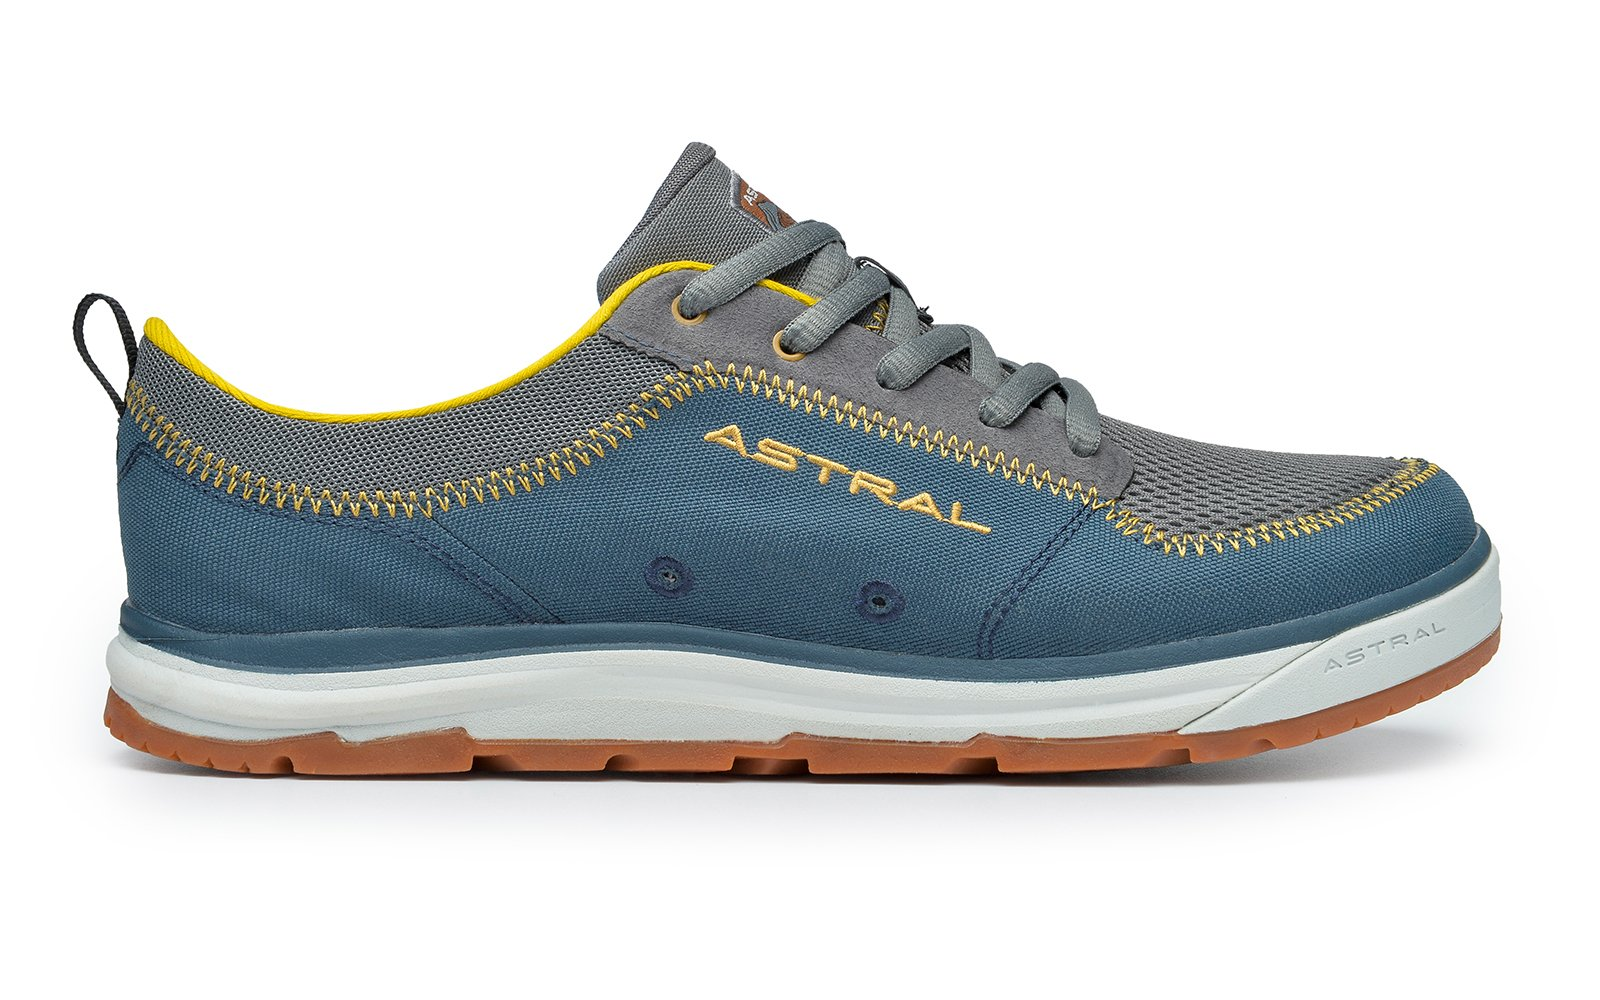 Astral Brewer 2.0 Men's Water Shoe - Storm Navy - M10